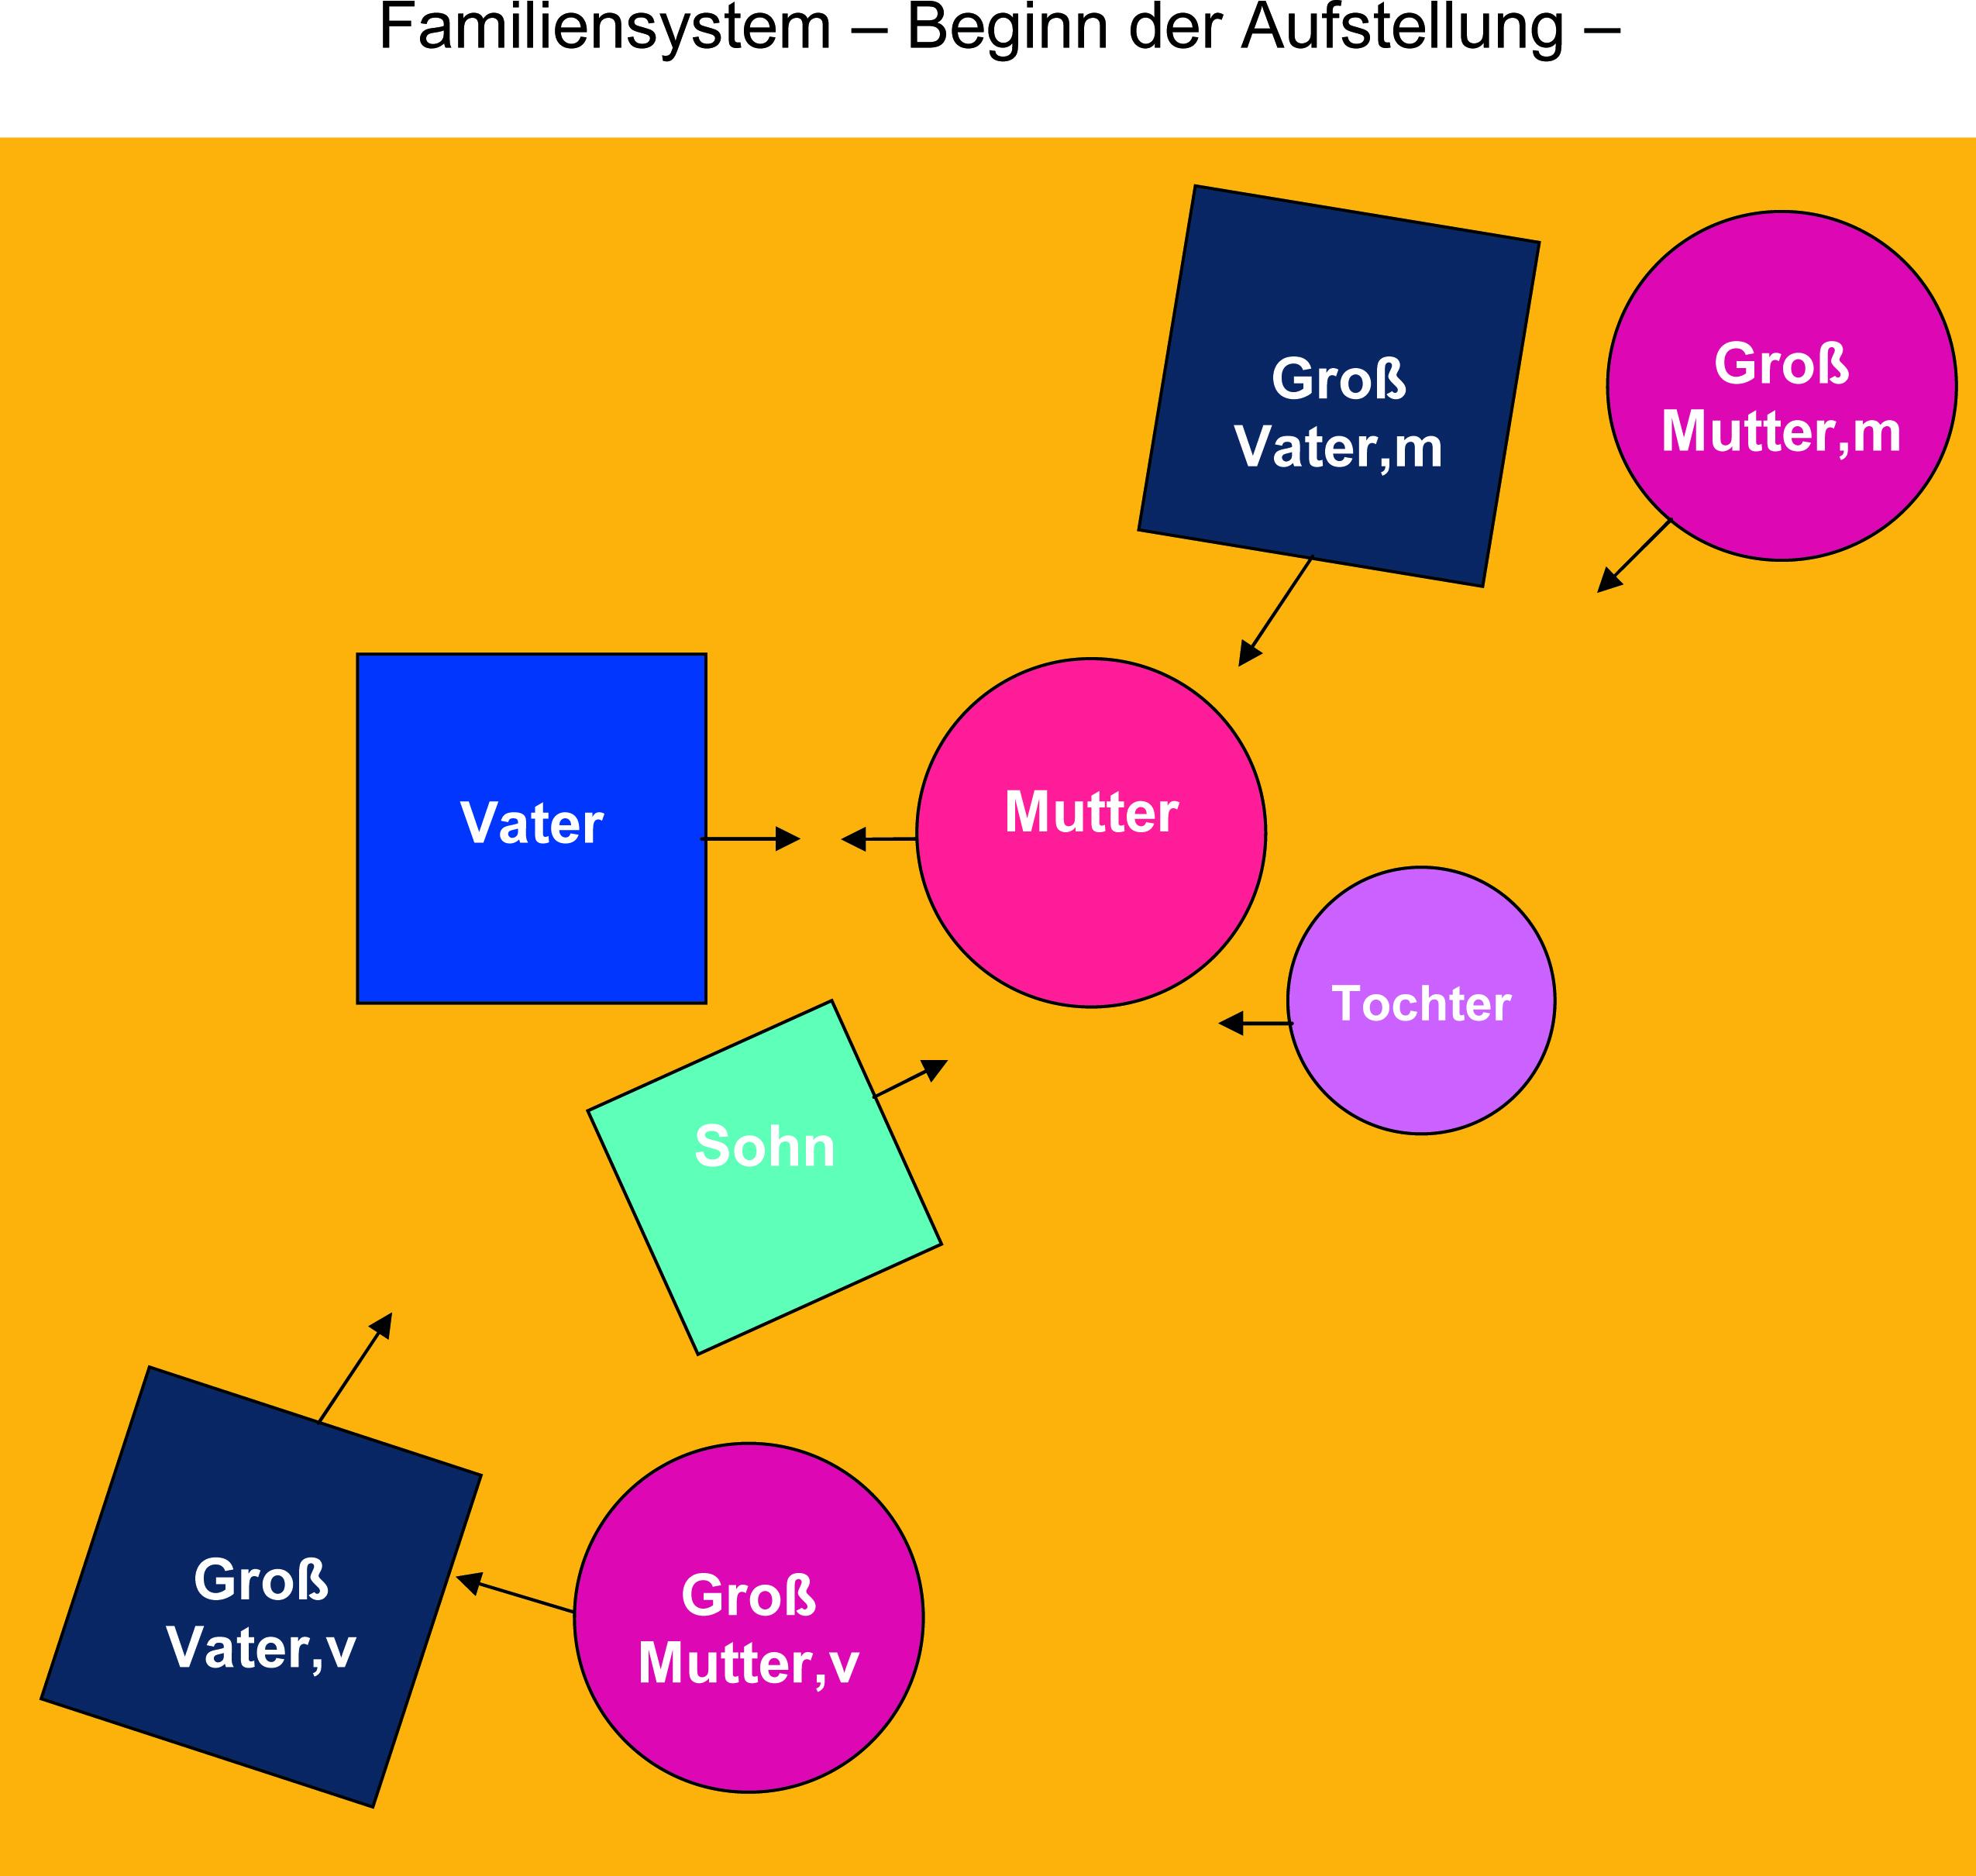 Familiensystem 2